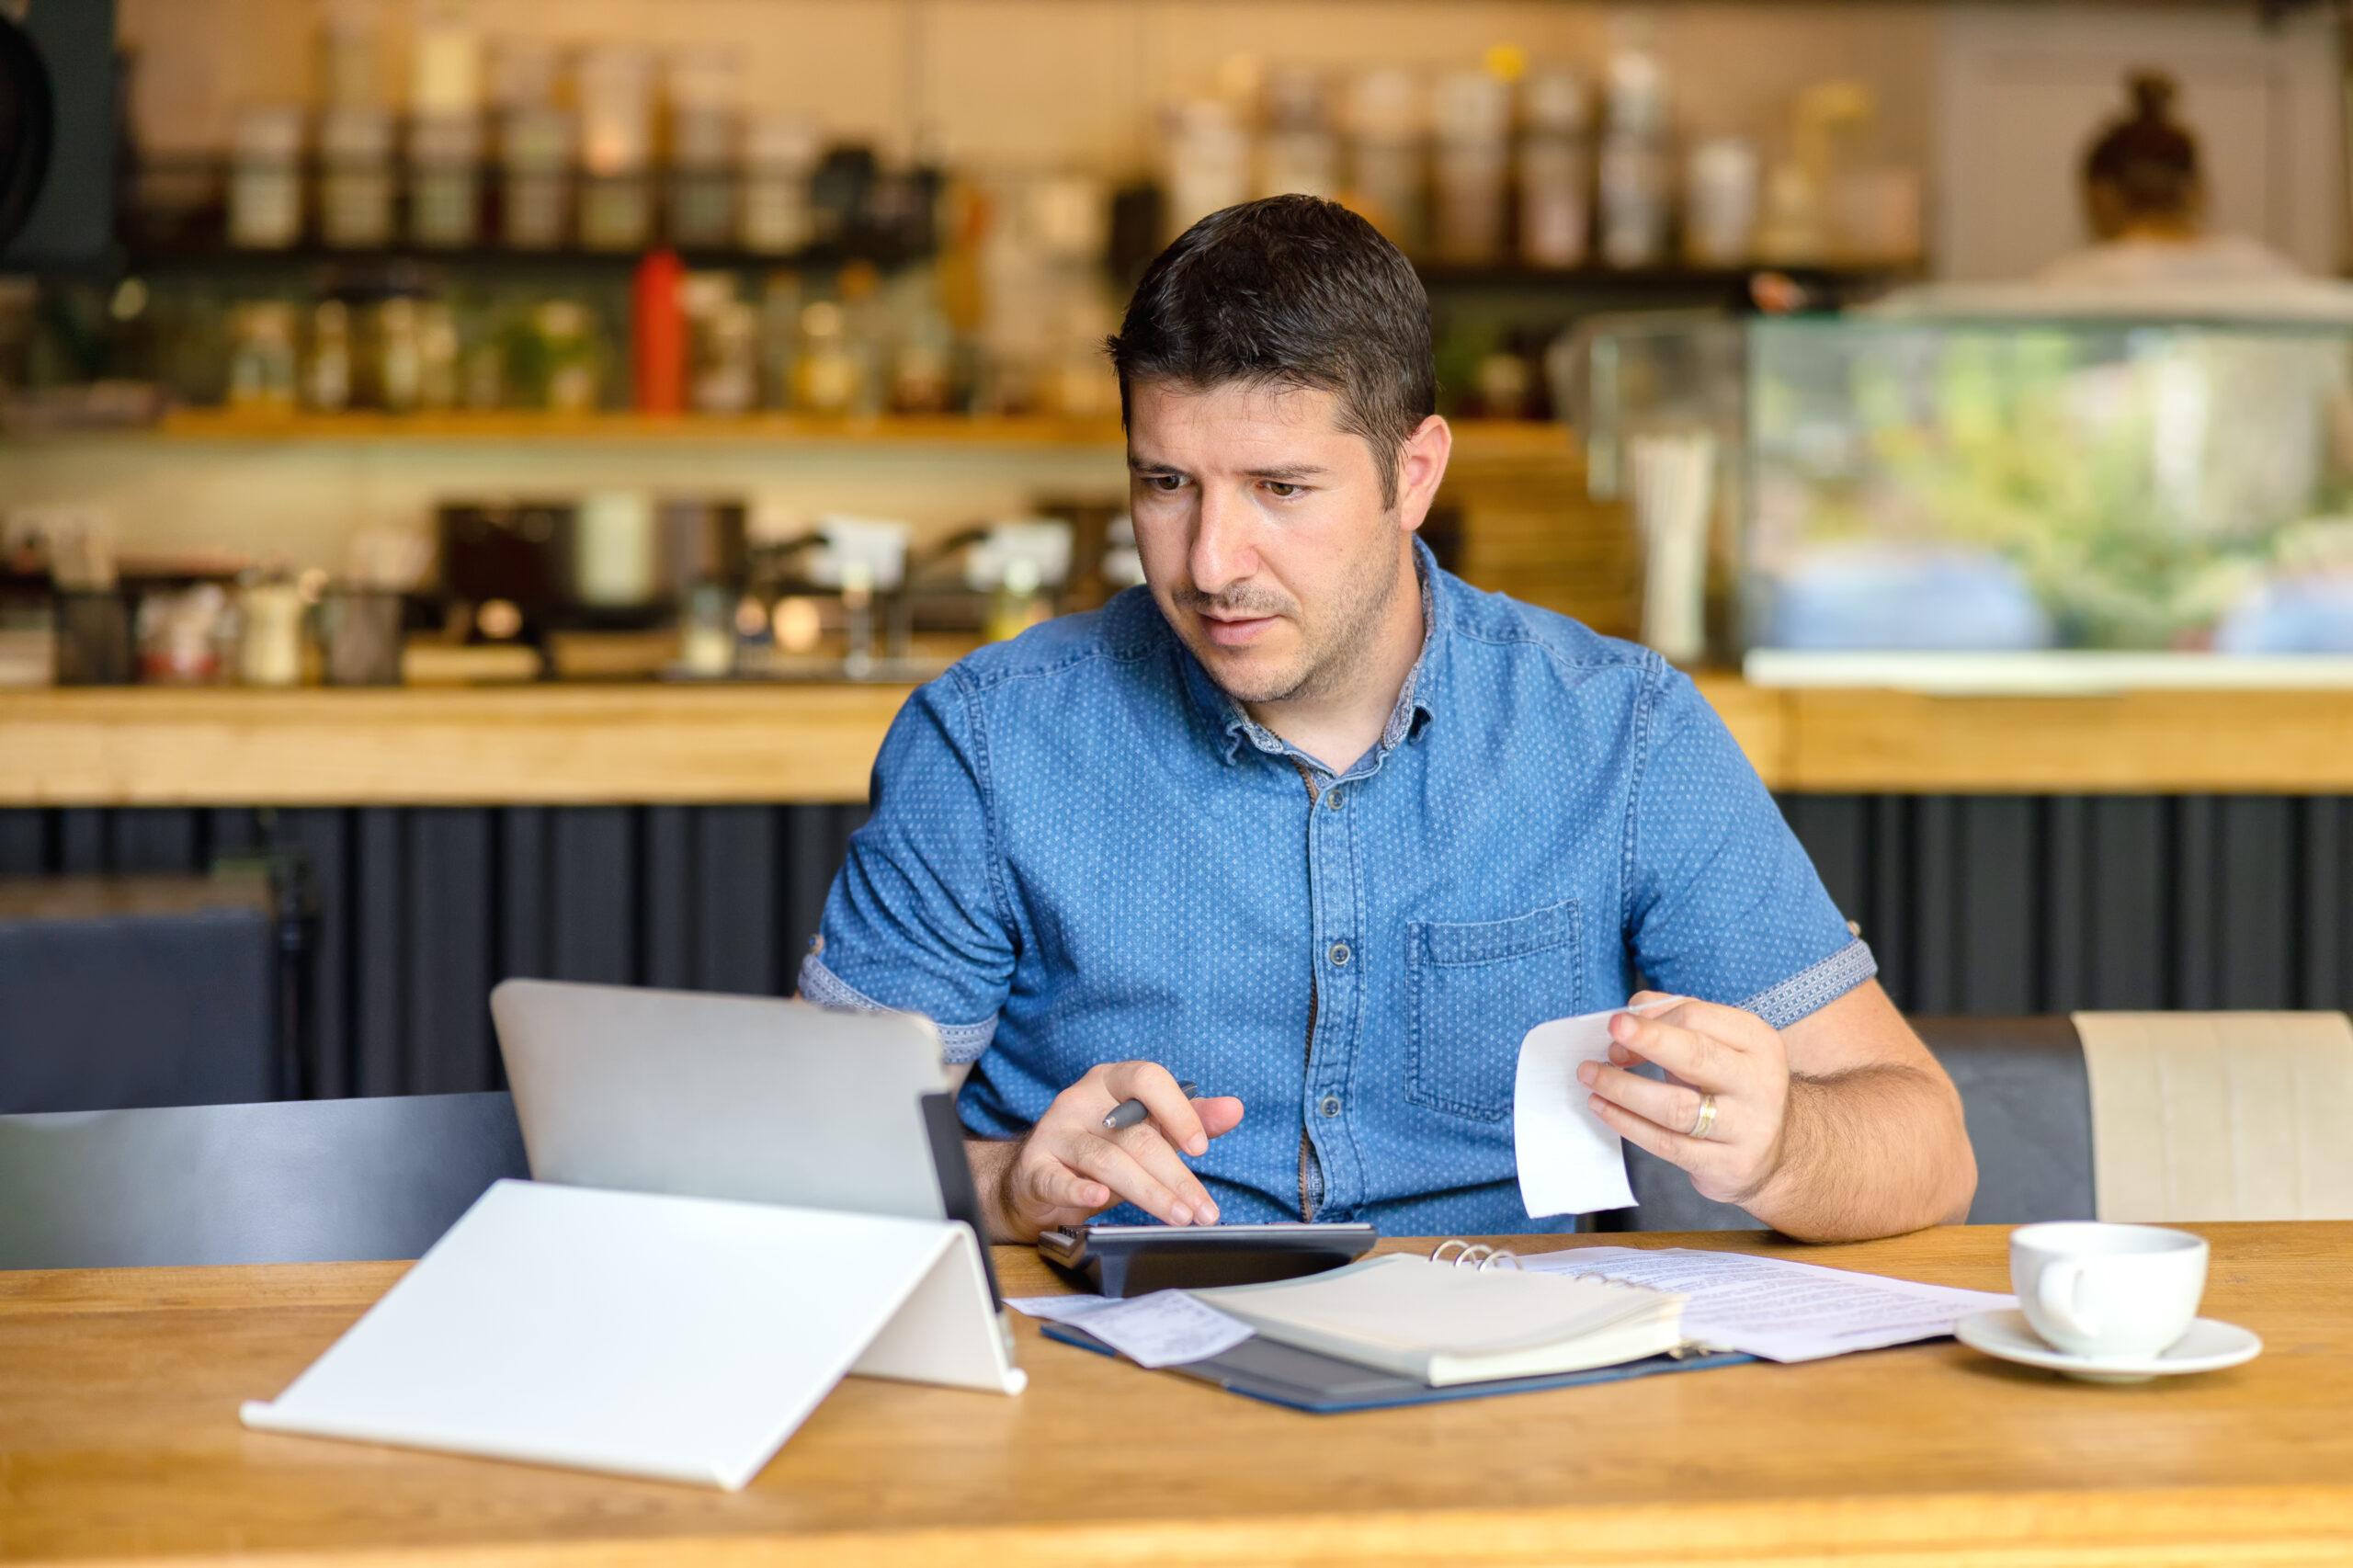 Restaurant owner calculating backup withholding